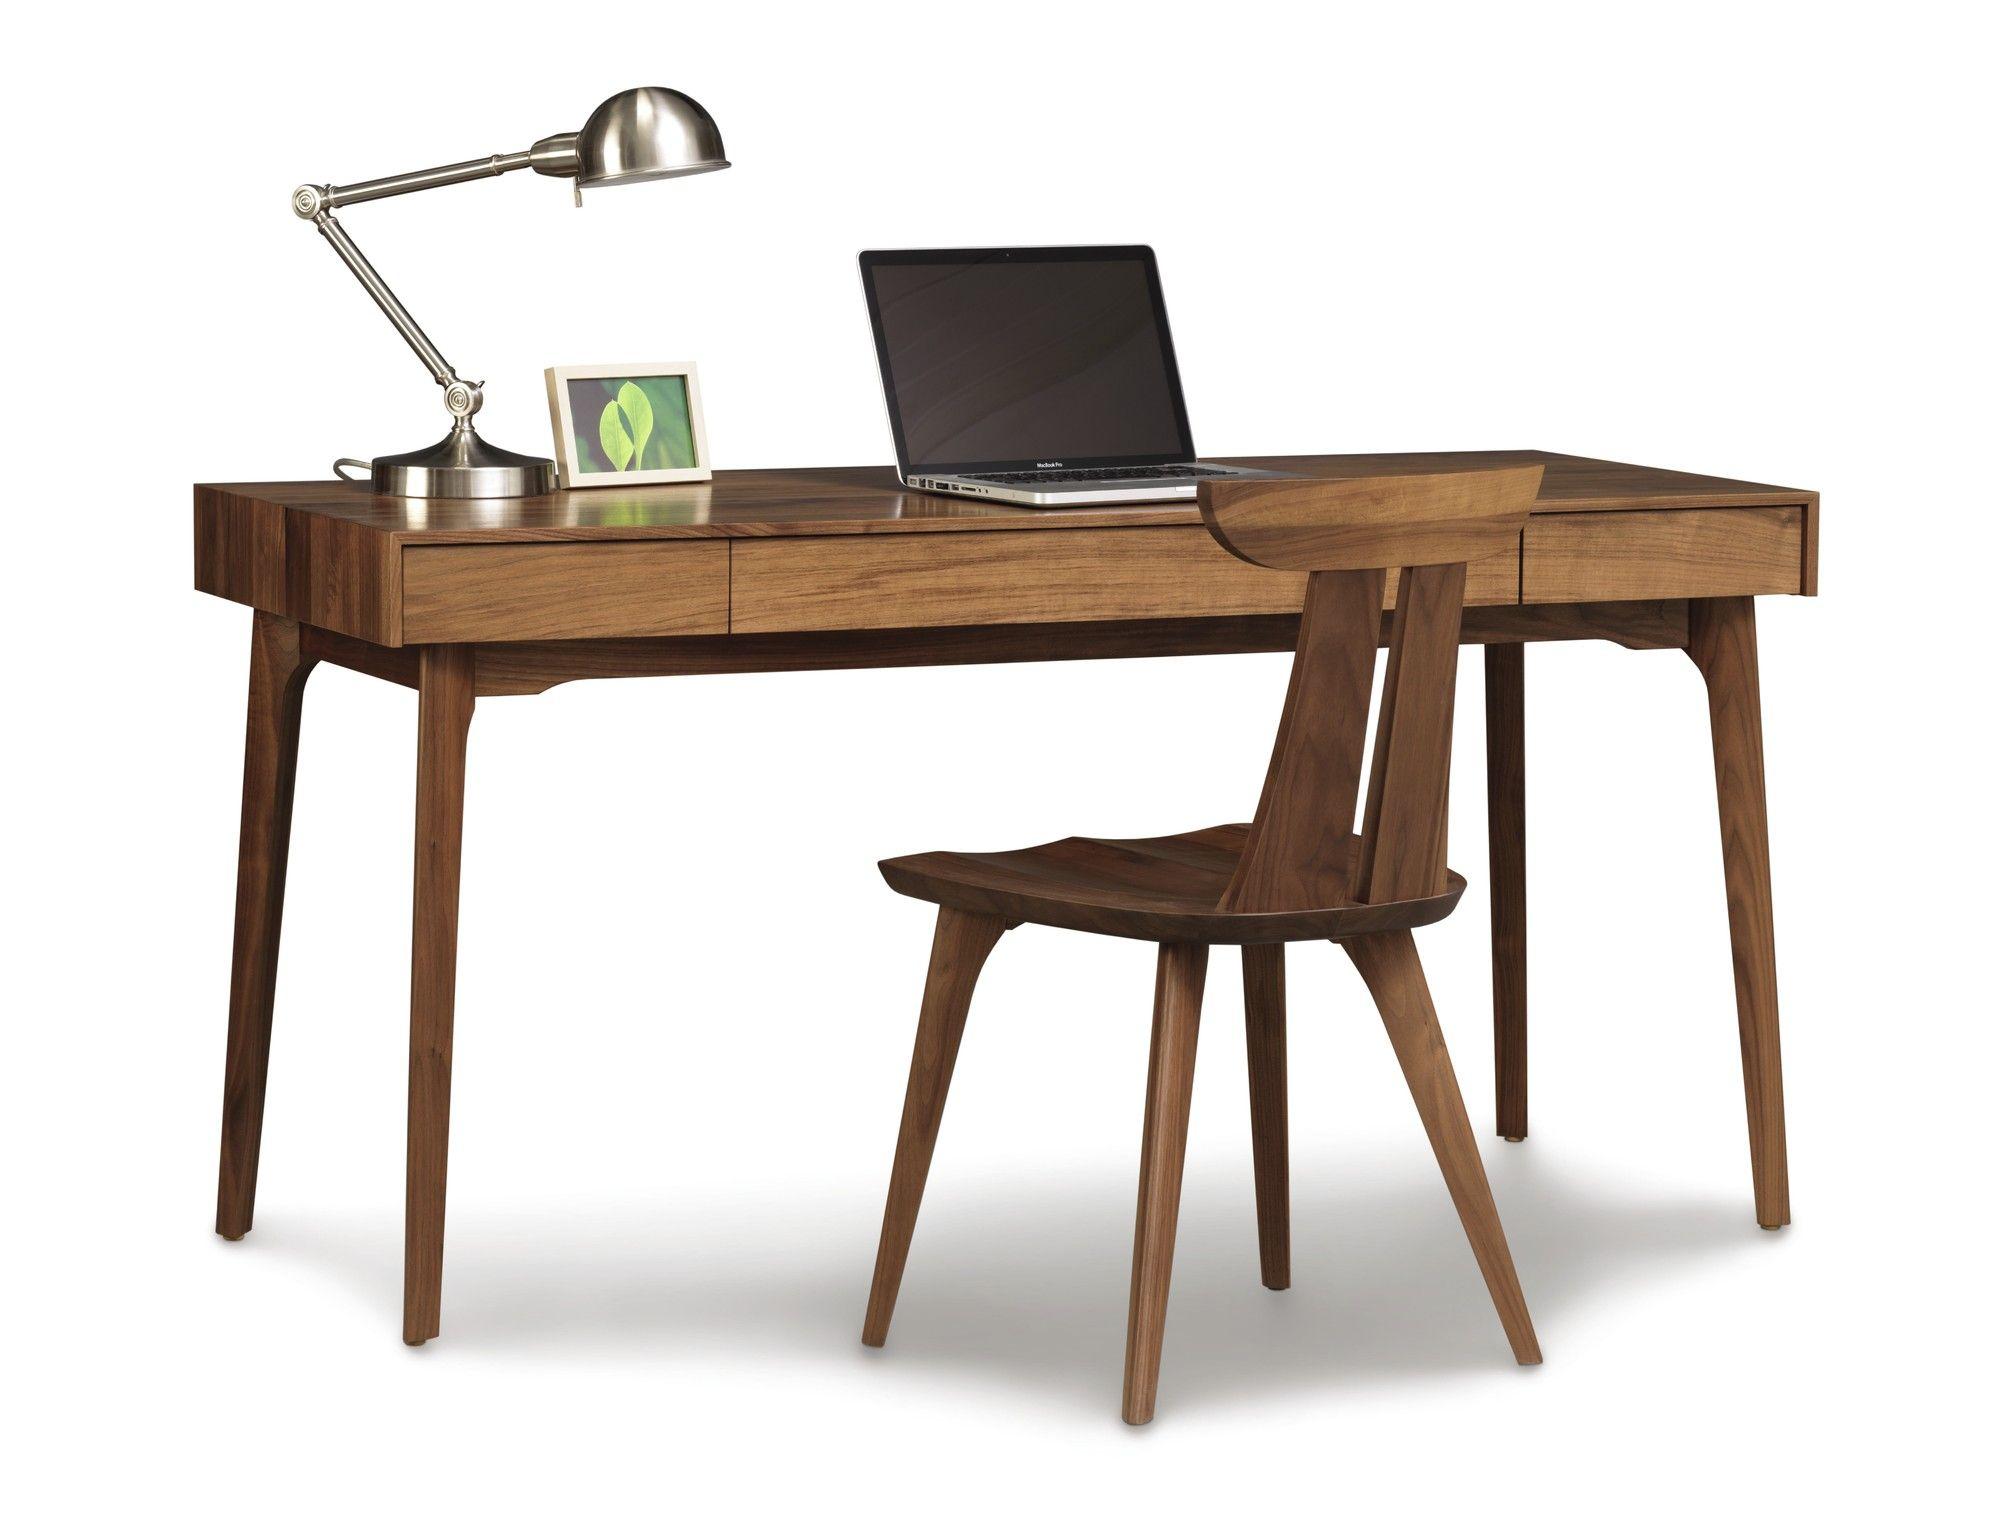 Copeland furniture catalina writing desk allmodern